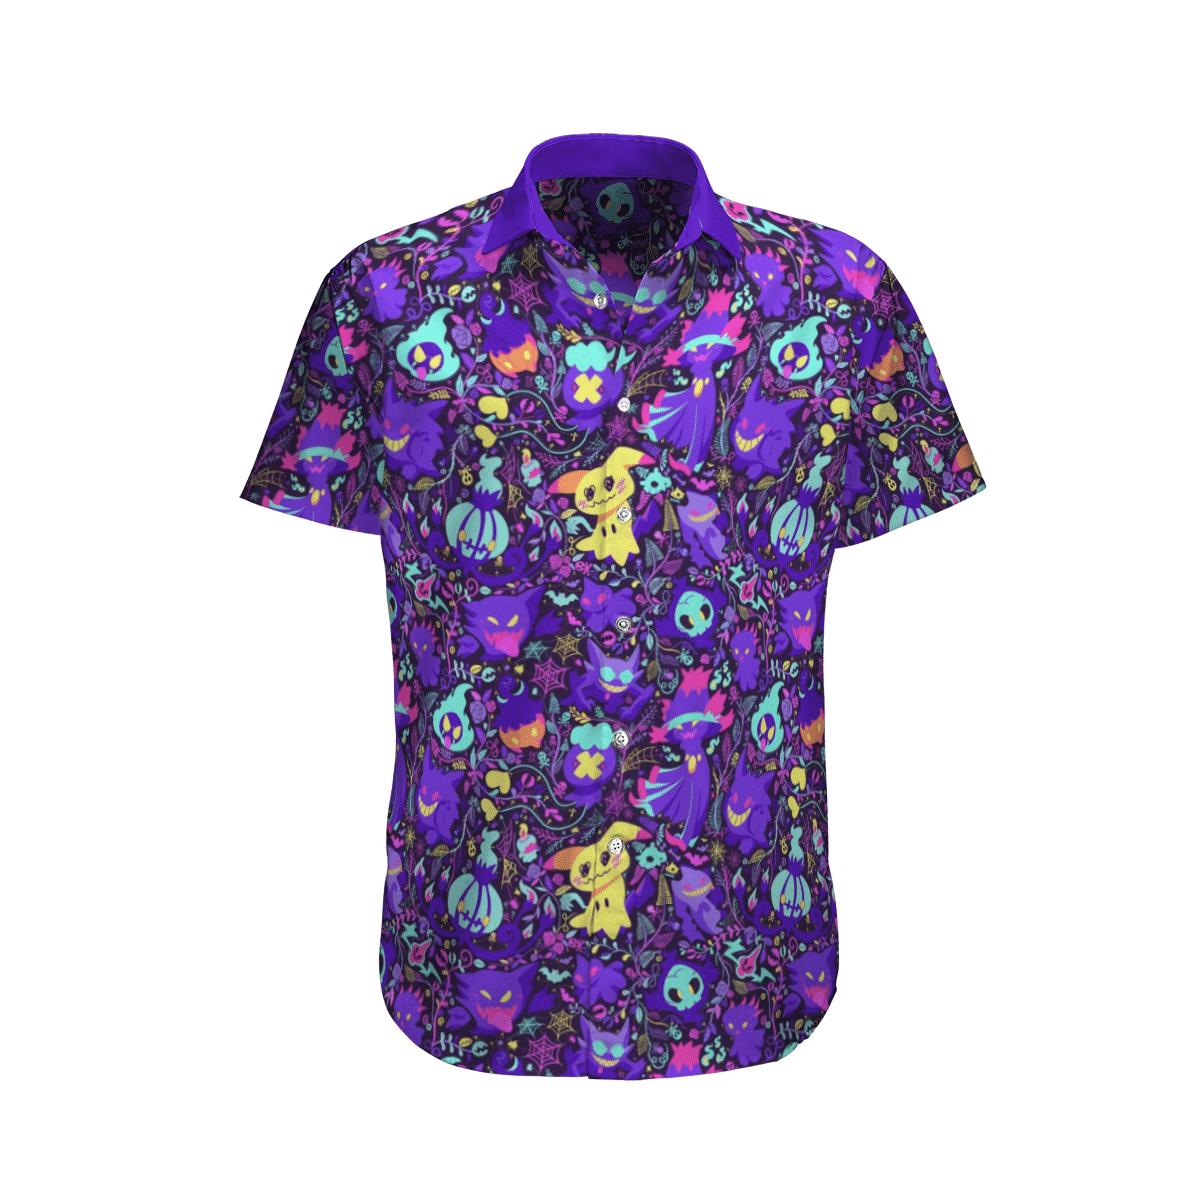 Ghost Pokemon Hawaiian Shirt And Shorts